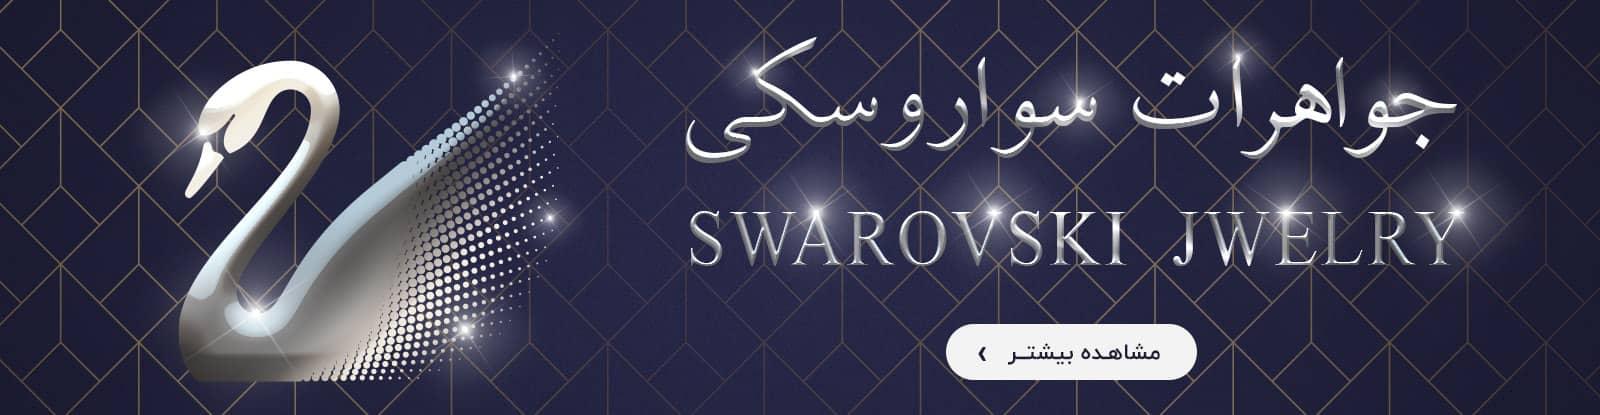 swarovski__bnr--min